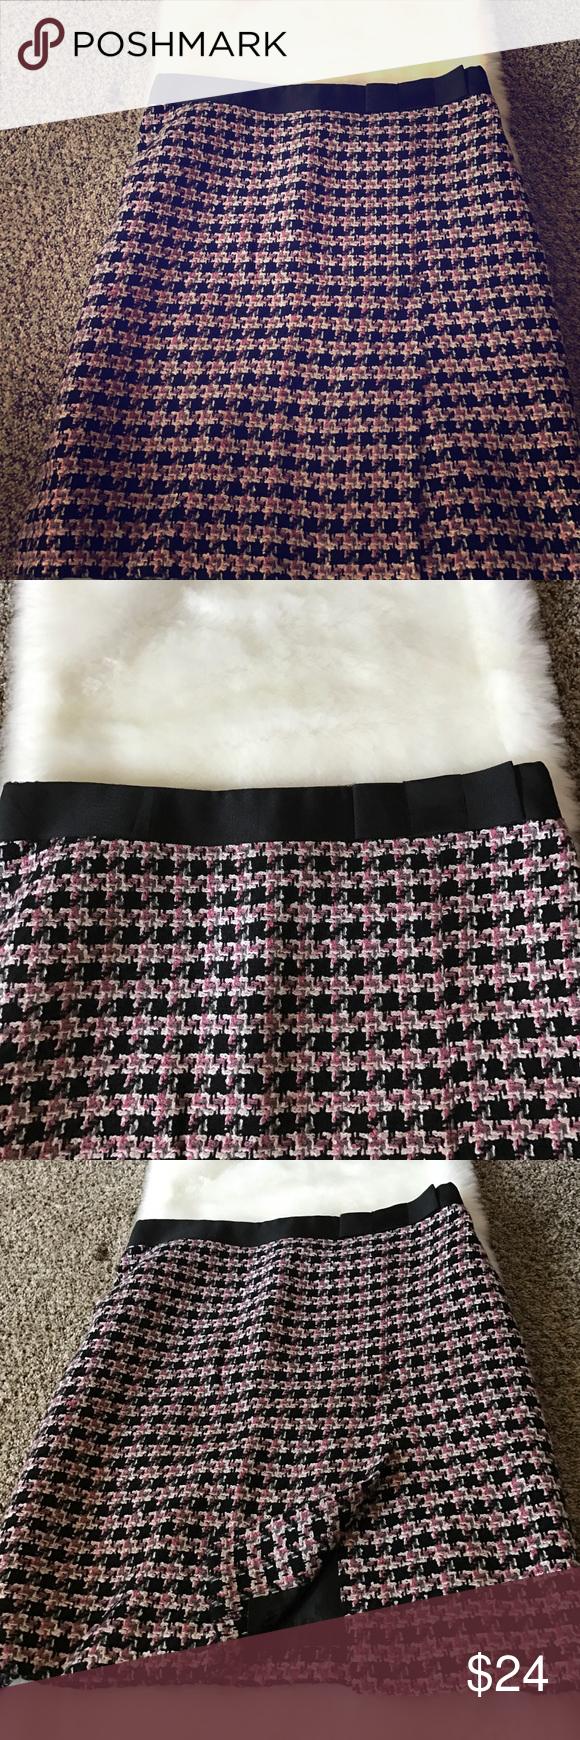 Skirt Tweed pink black white and gray classic business skirt. Uniform JohnPaulRichard Skirts Midi